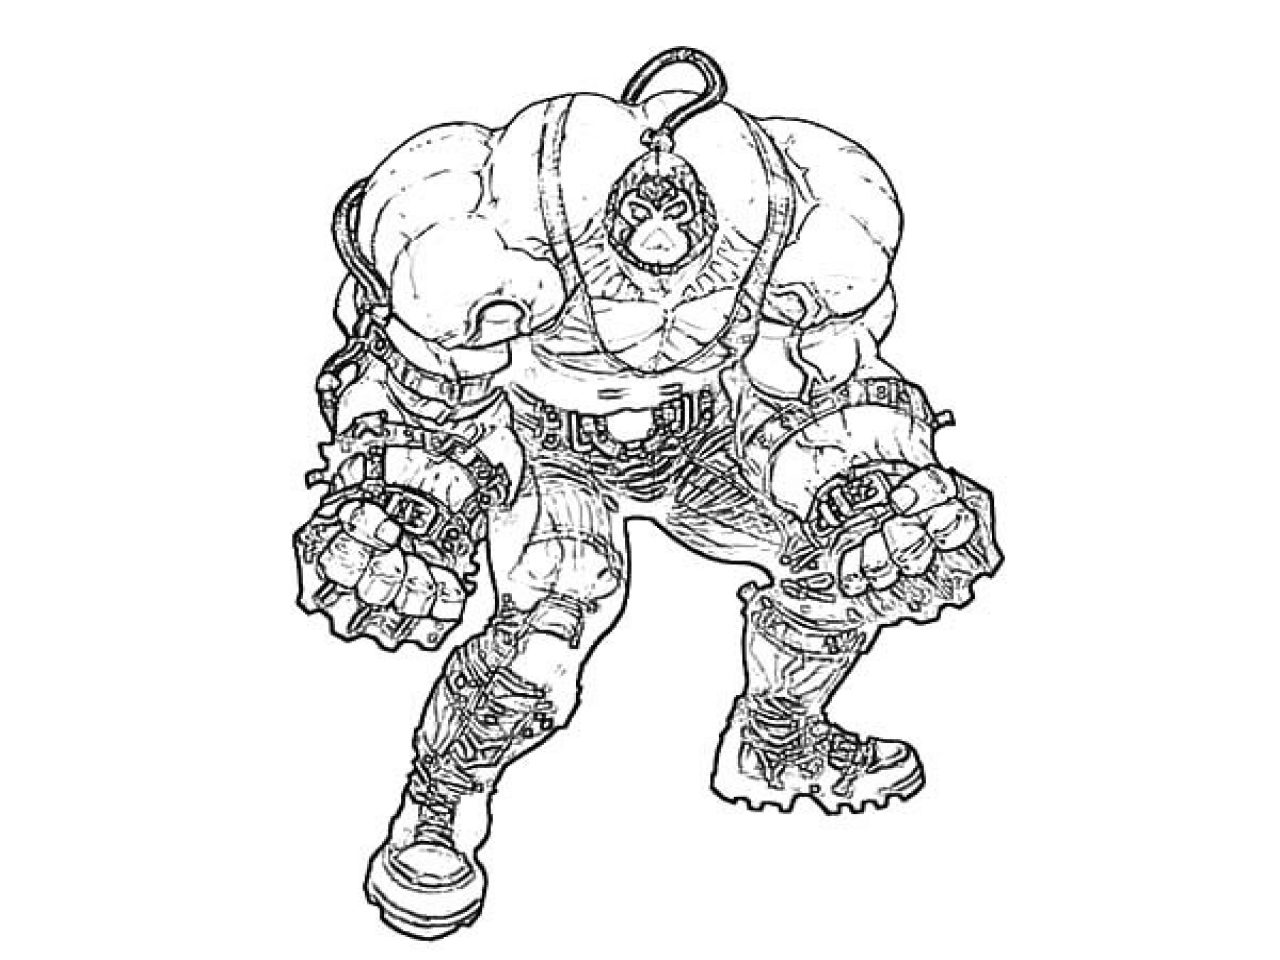 Cad Bane Drawing at GetDrawings | Free download